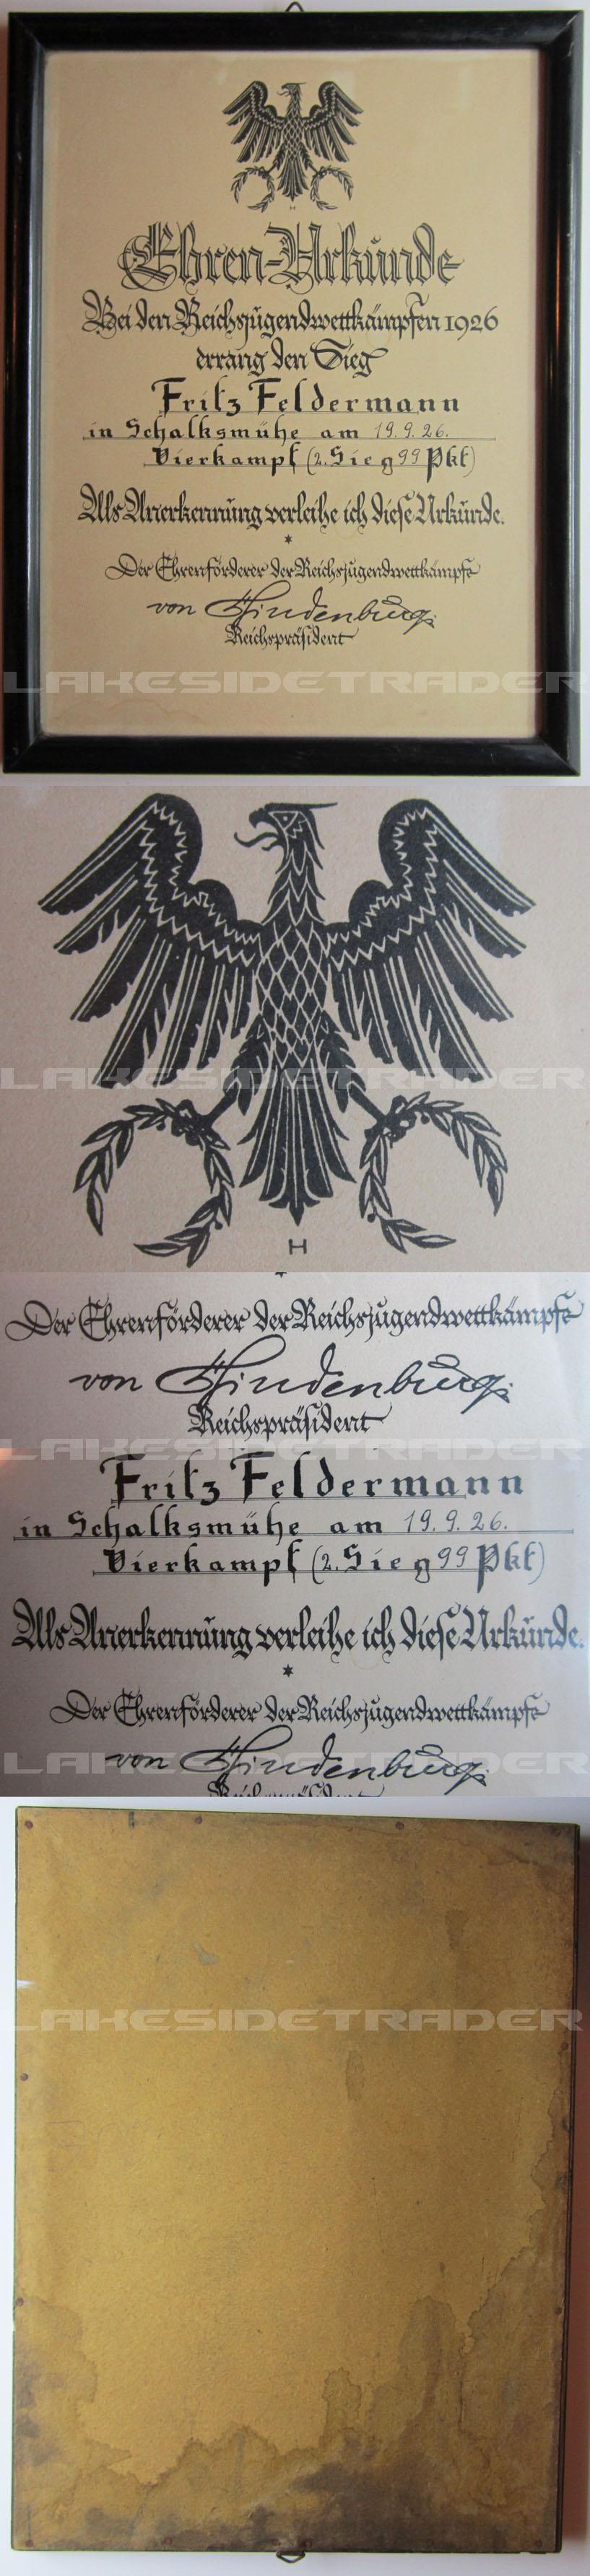 Hindenburg SIgnature on award document